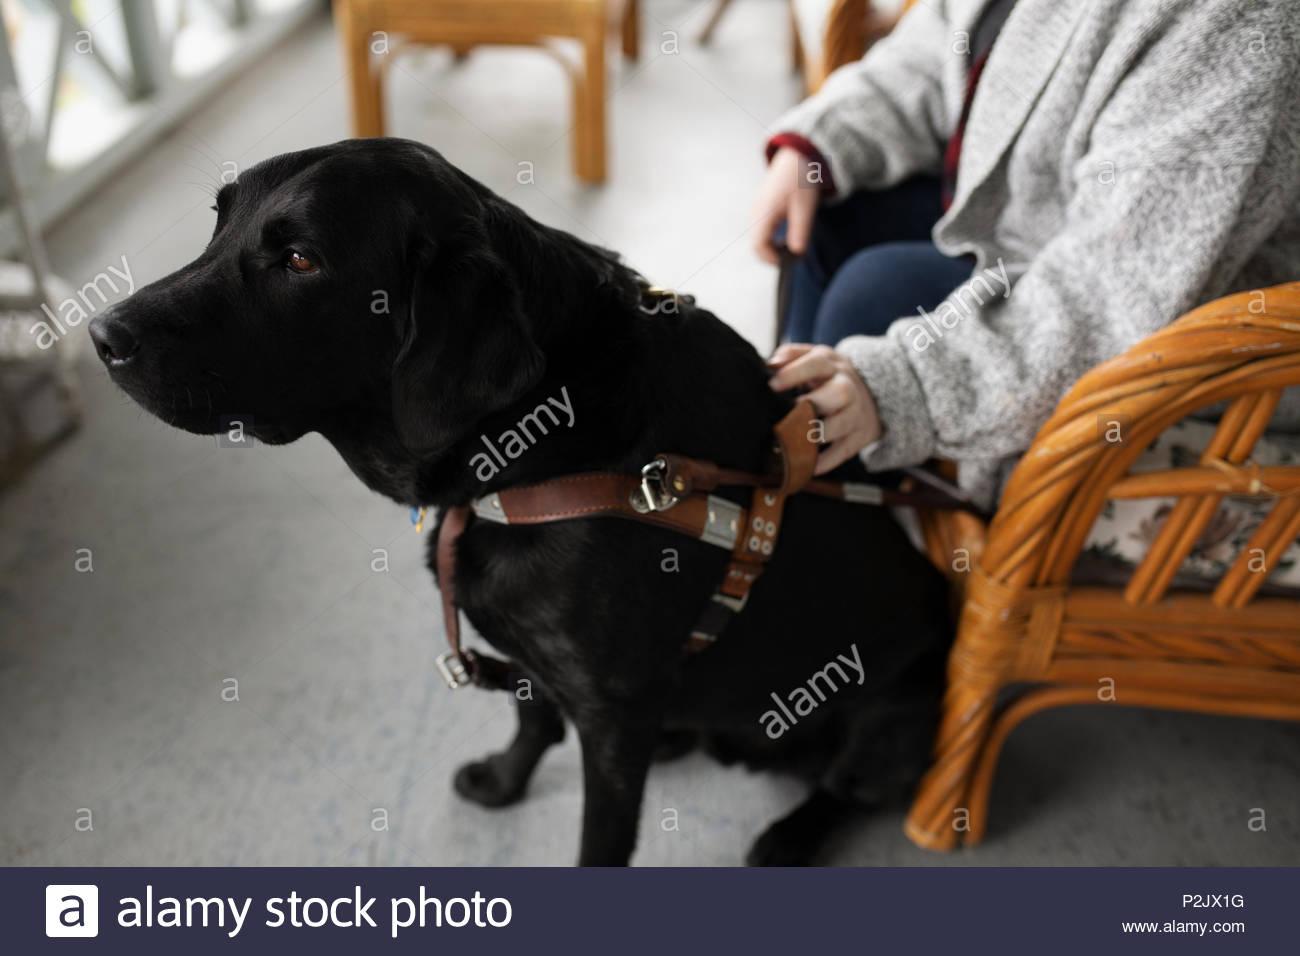 Woman with black seeing eye dog - Stock Image